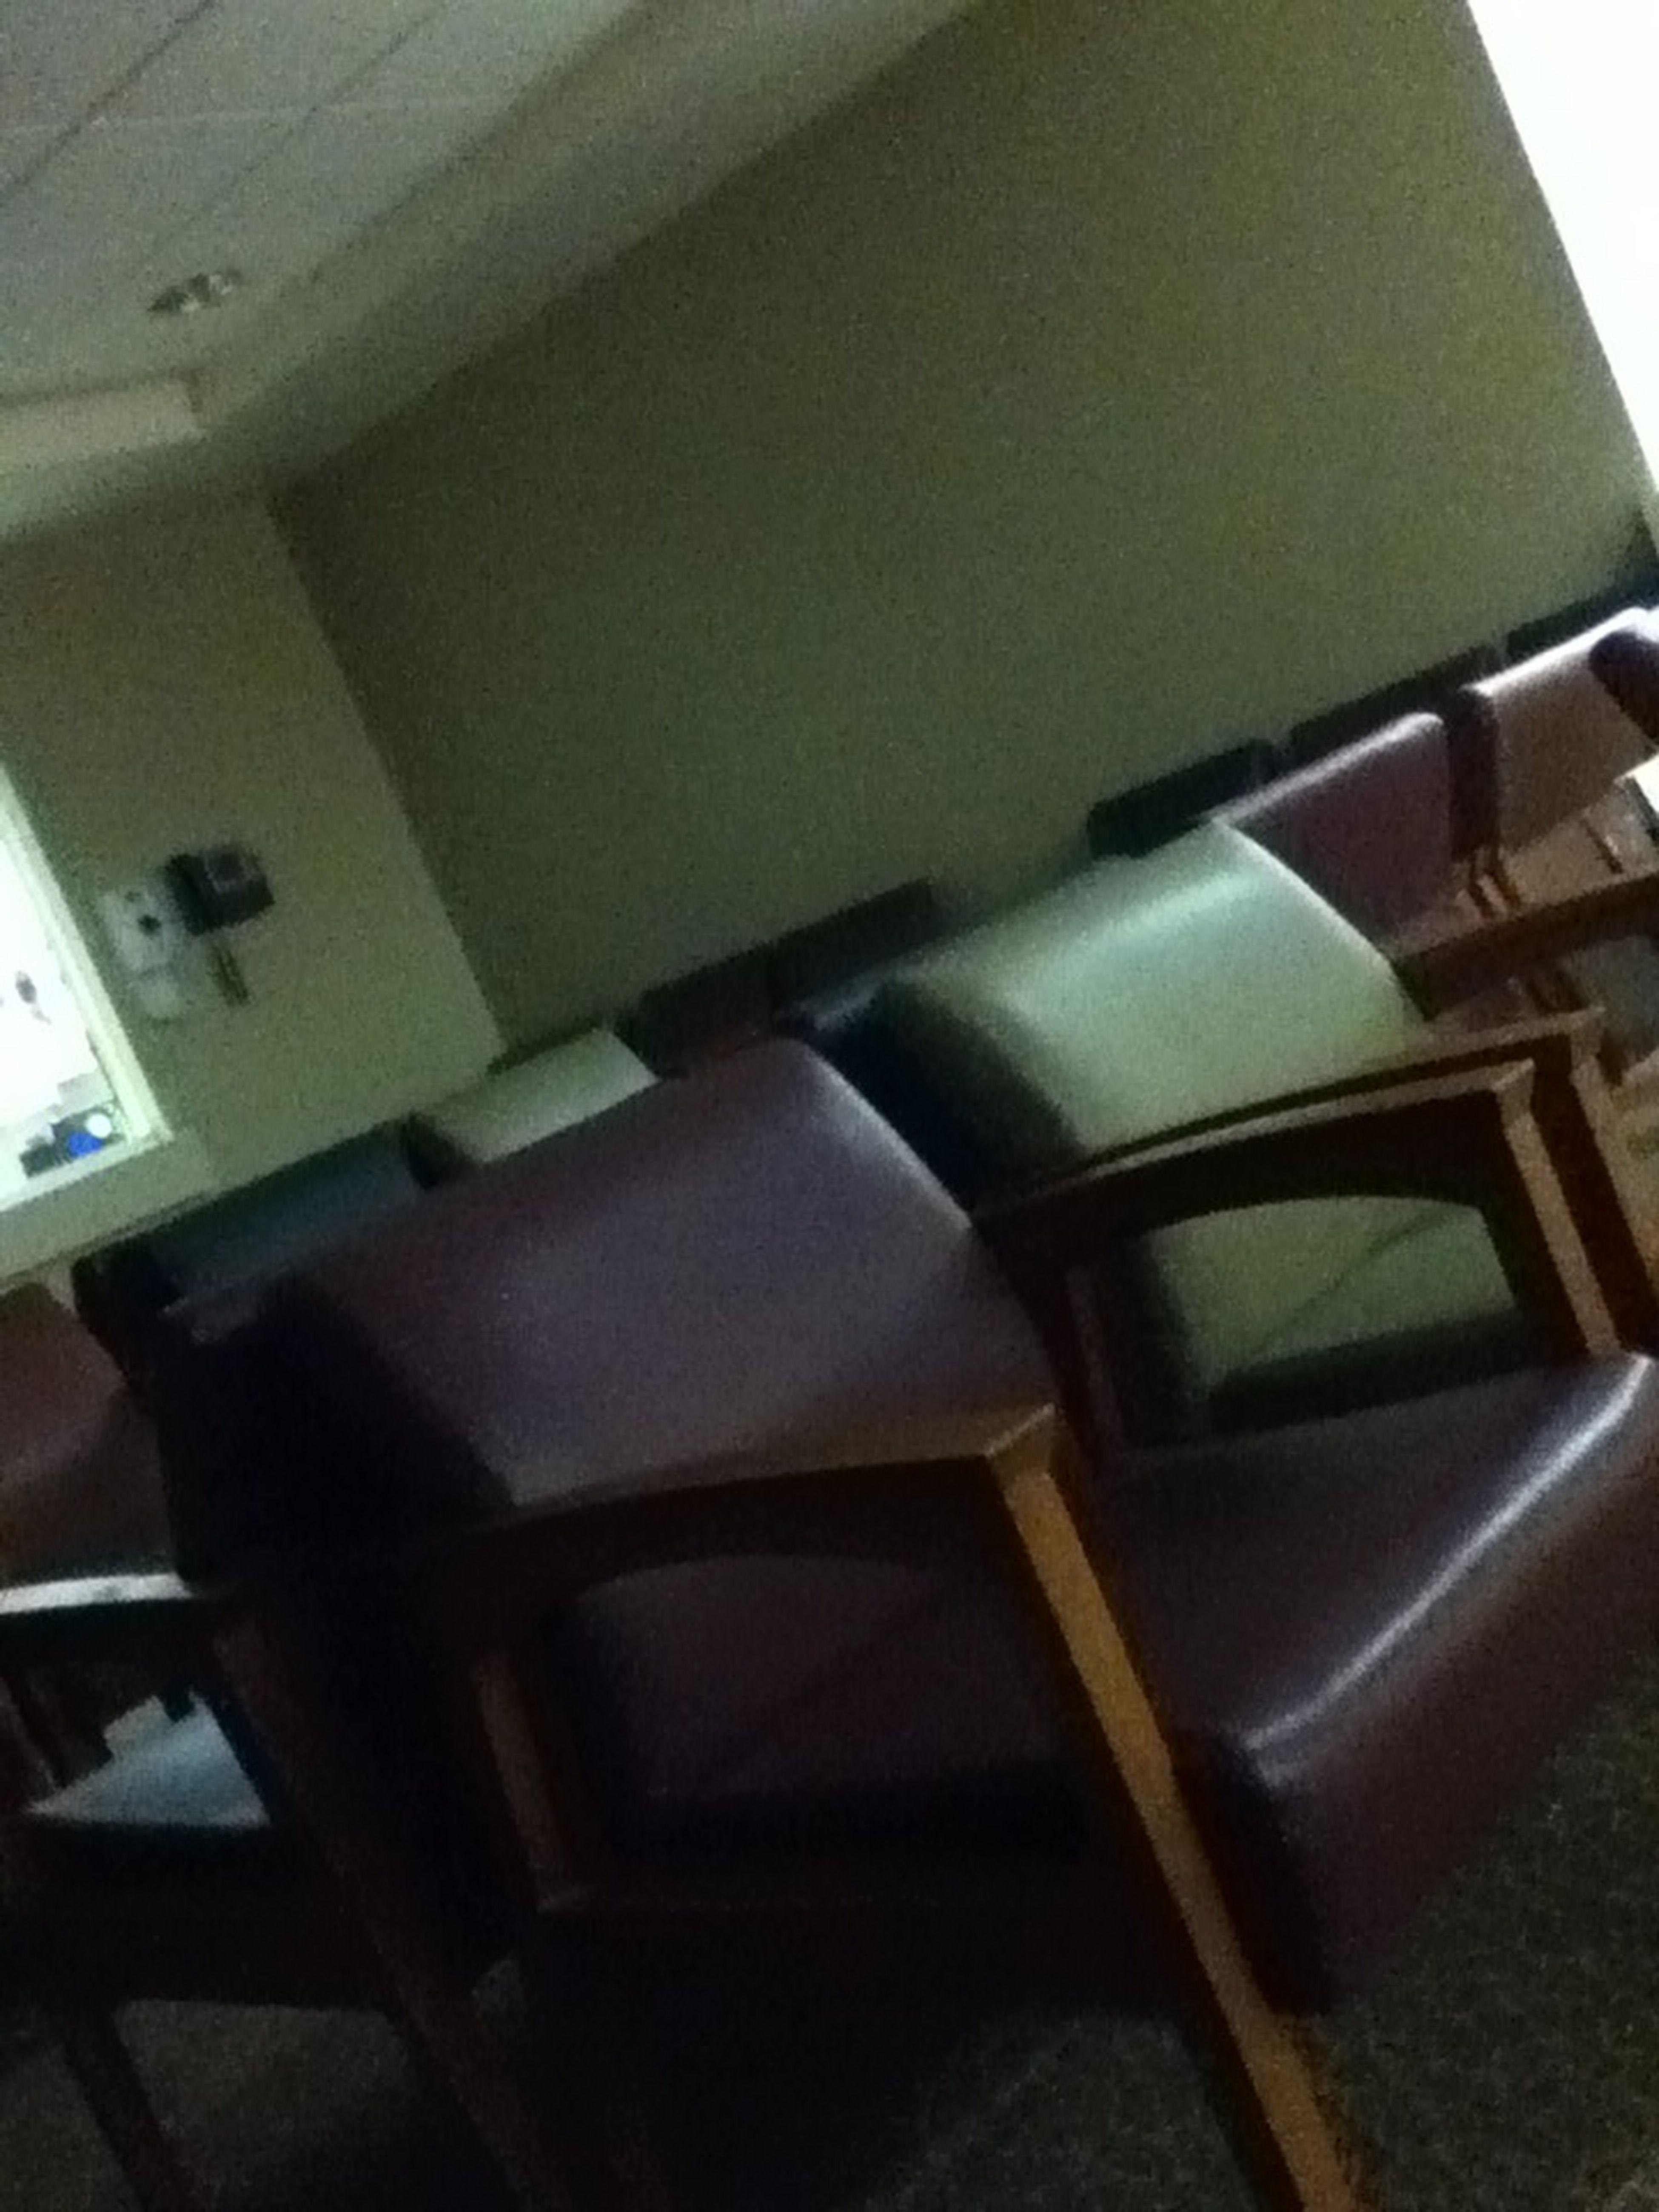 The Lights Juss' Shut Off At My Moms Doctor! #Awkward!